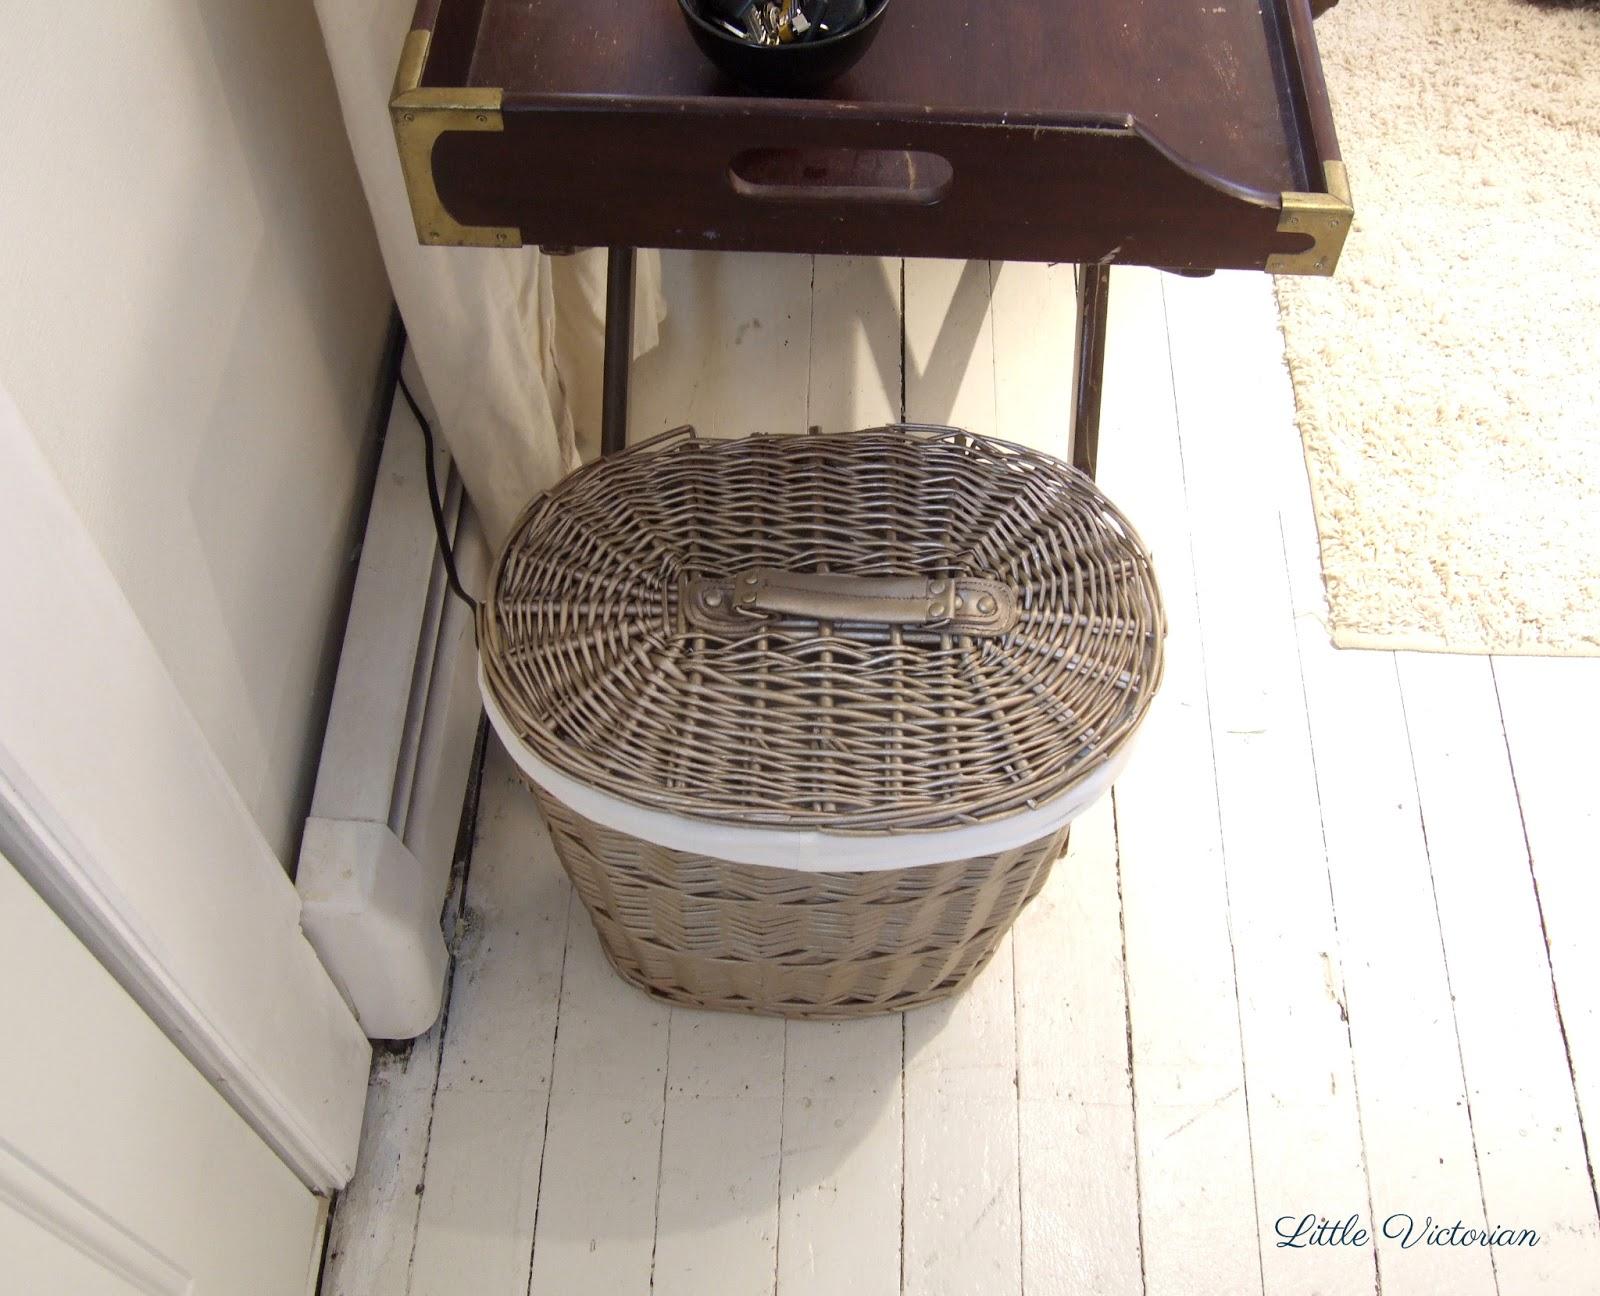 Painted wicker basket to hide paper shredder at front door | Little Victorian